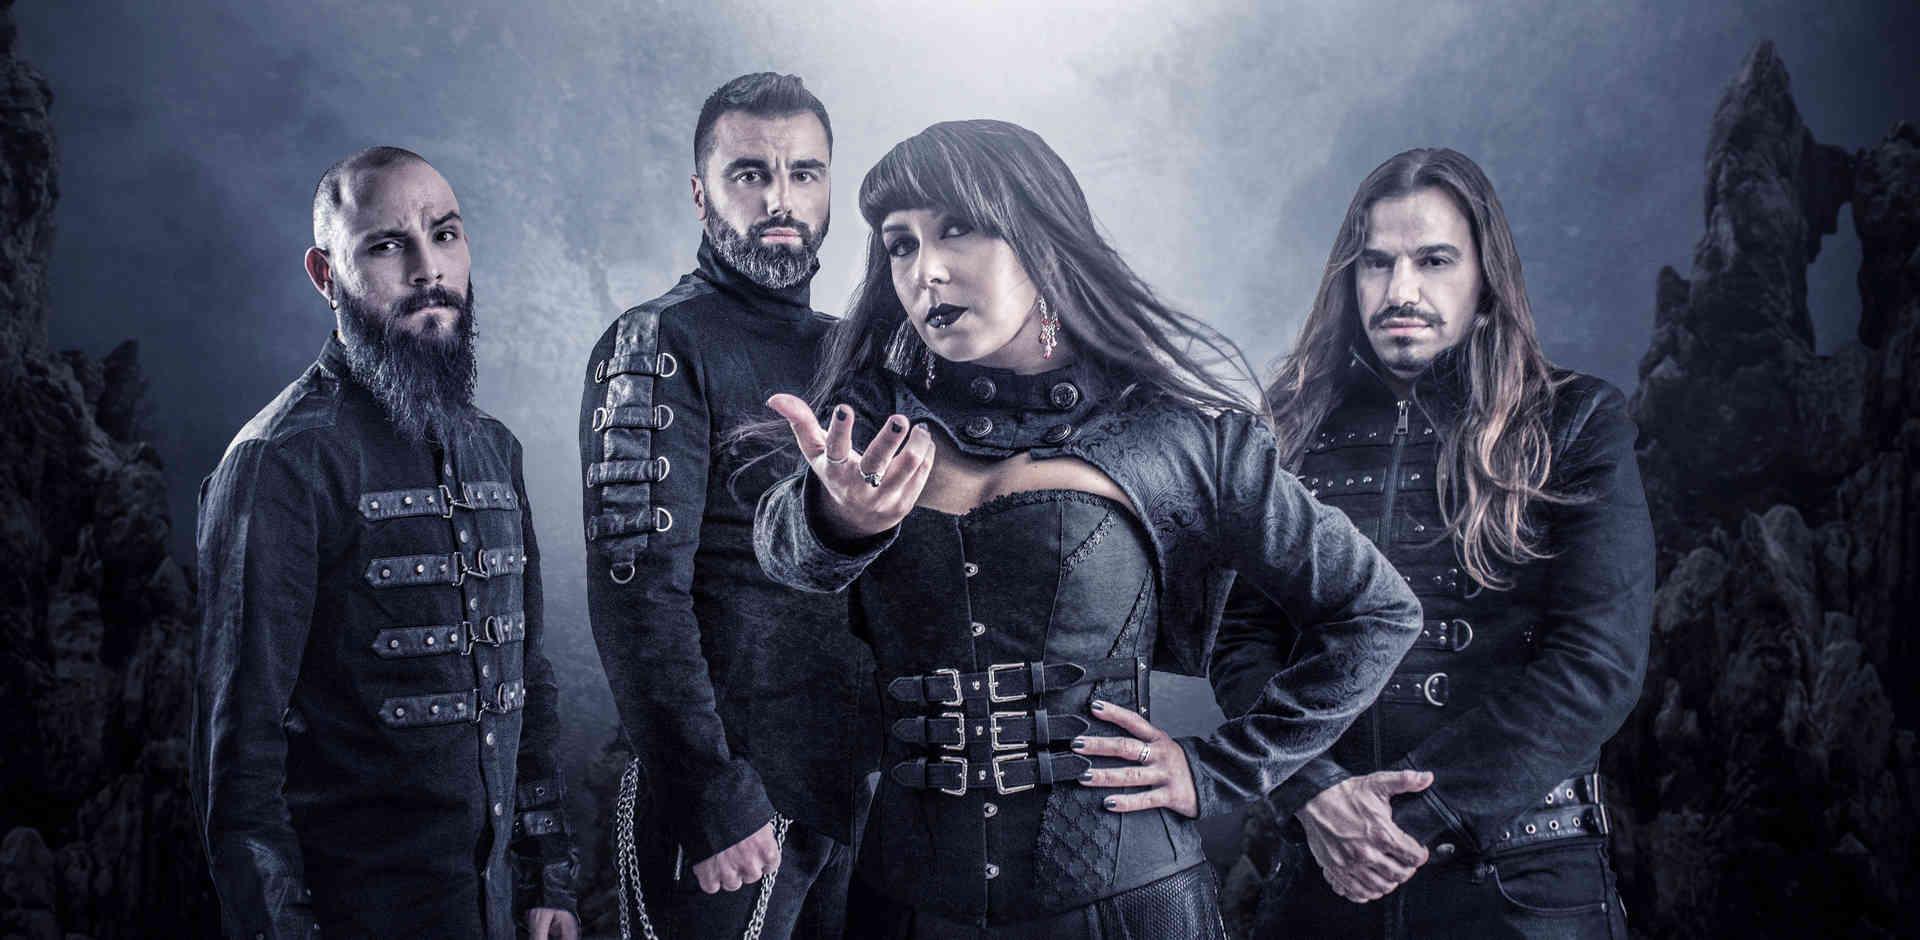 Sede Vacante Band - New Band Photo 2